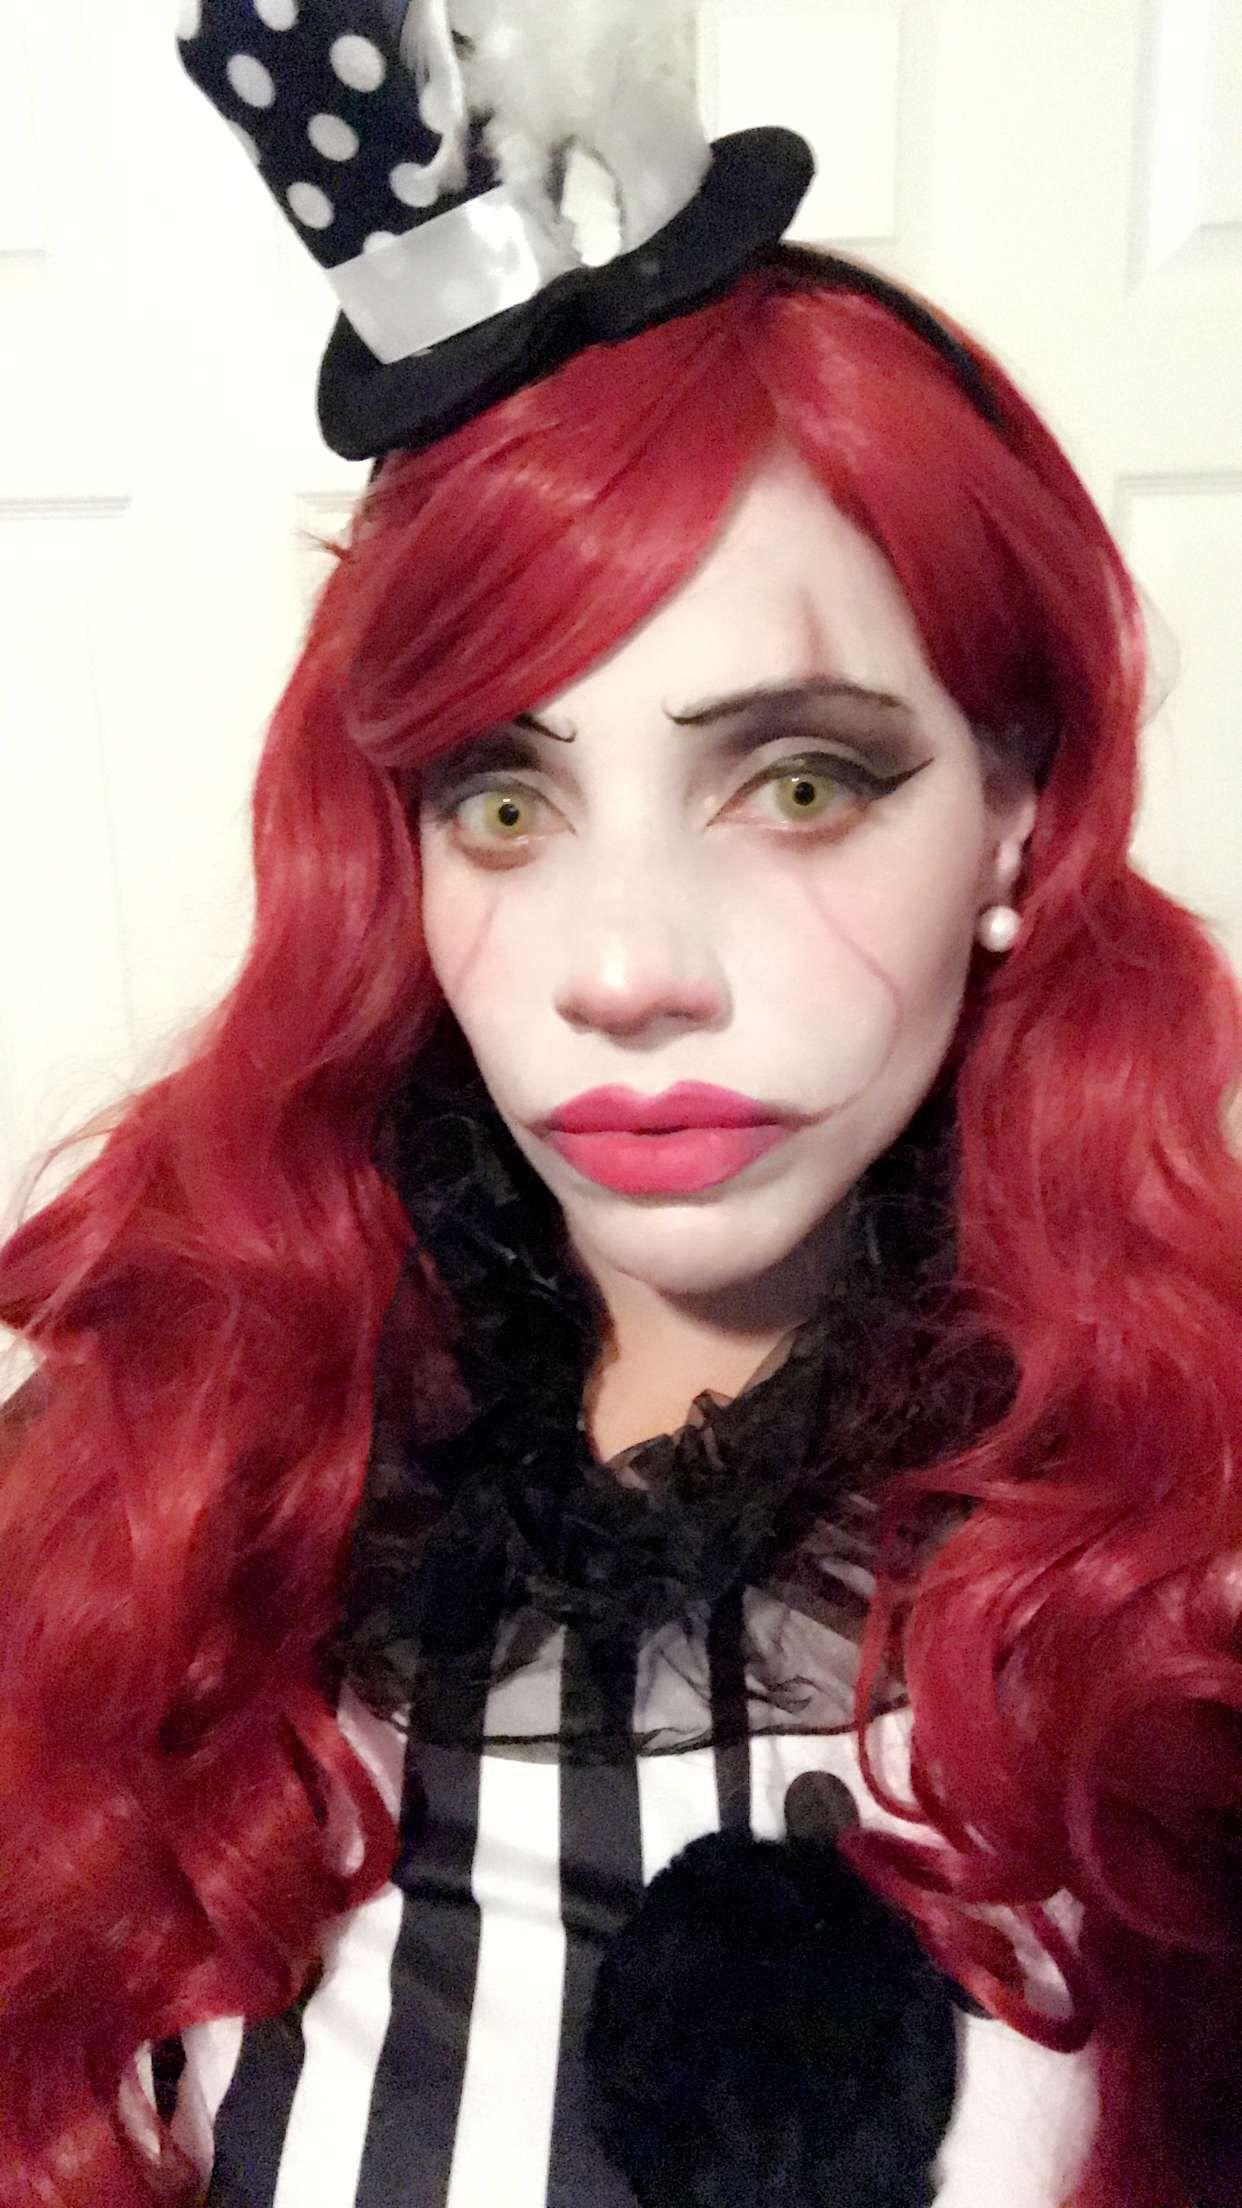 clown clowngirl it killerclown pennywise Face